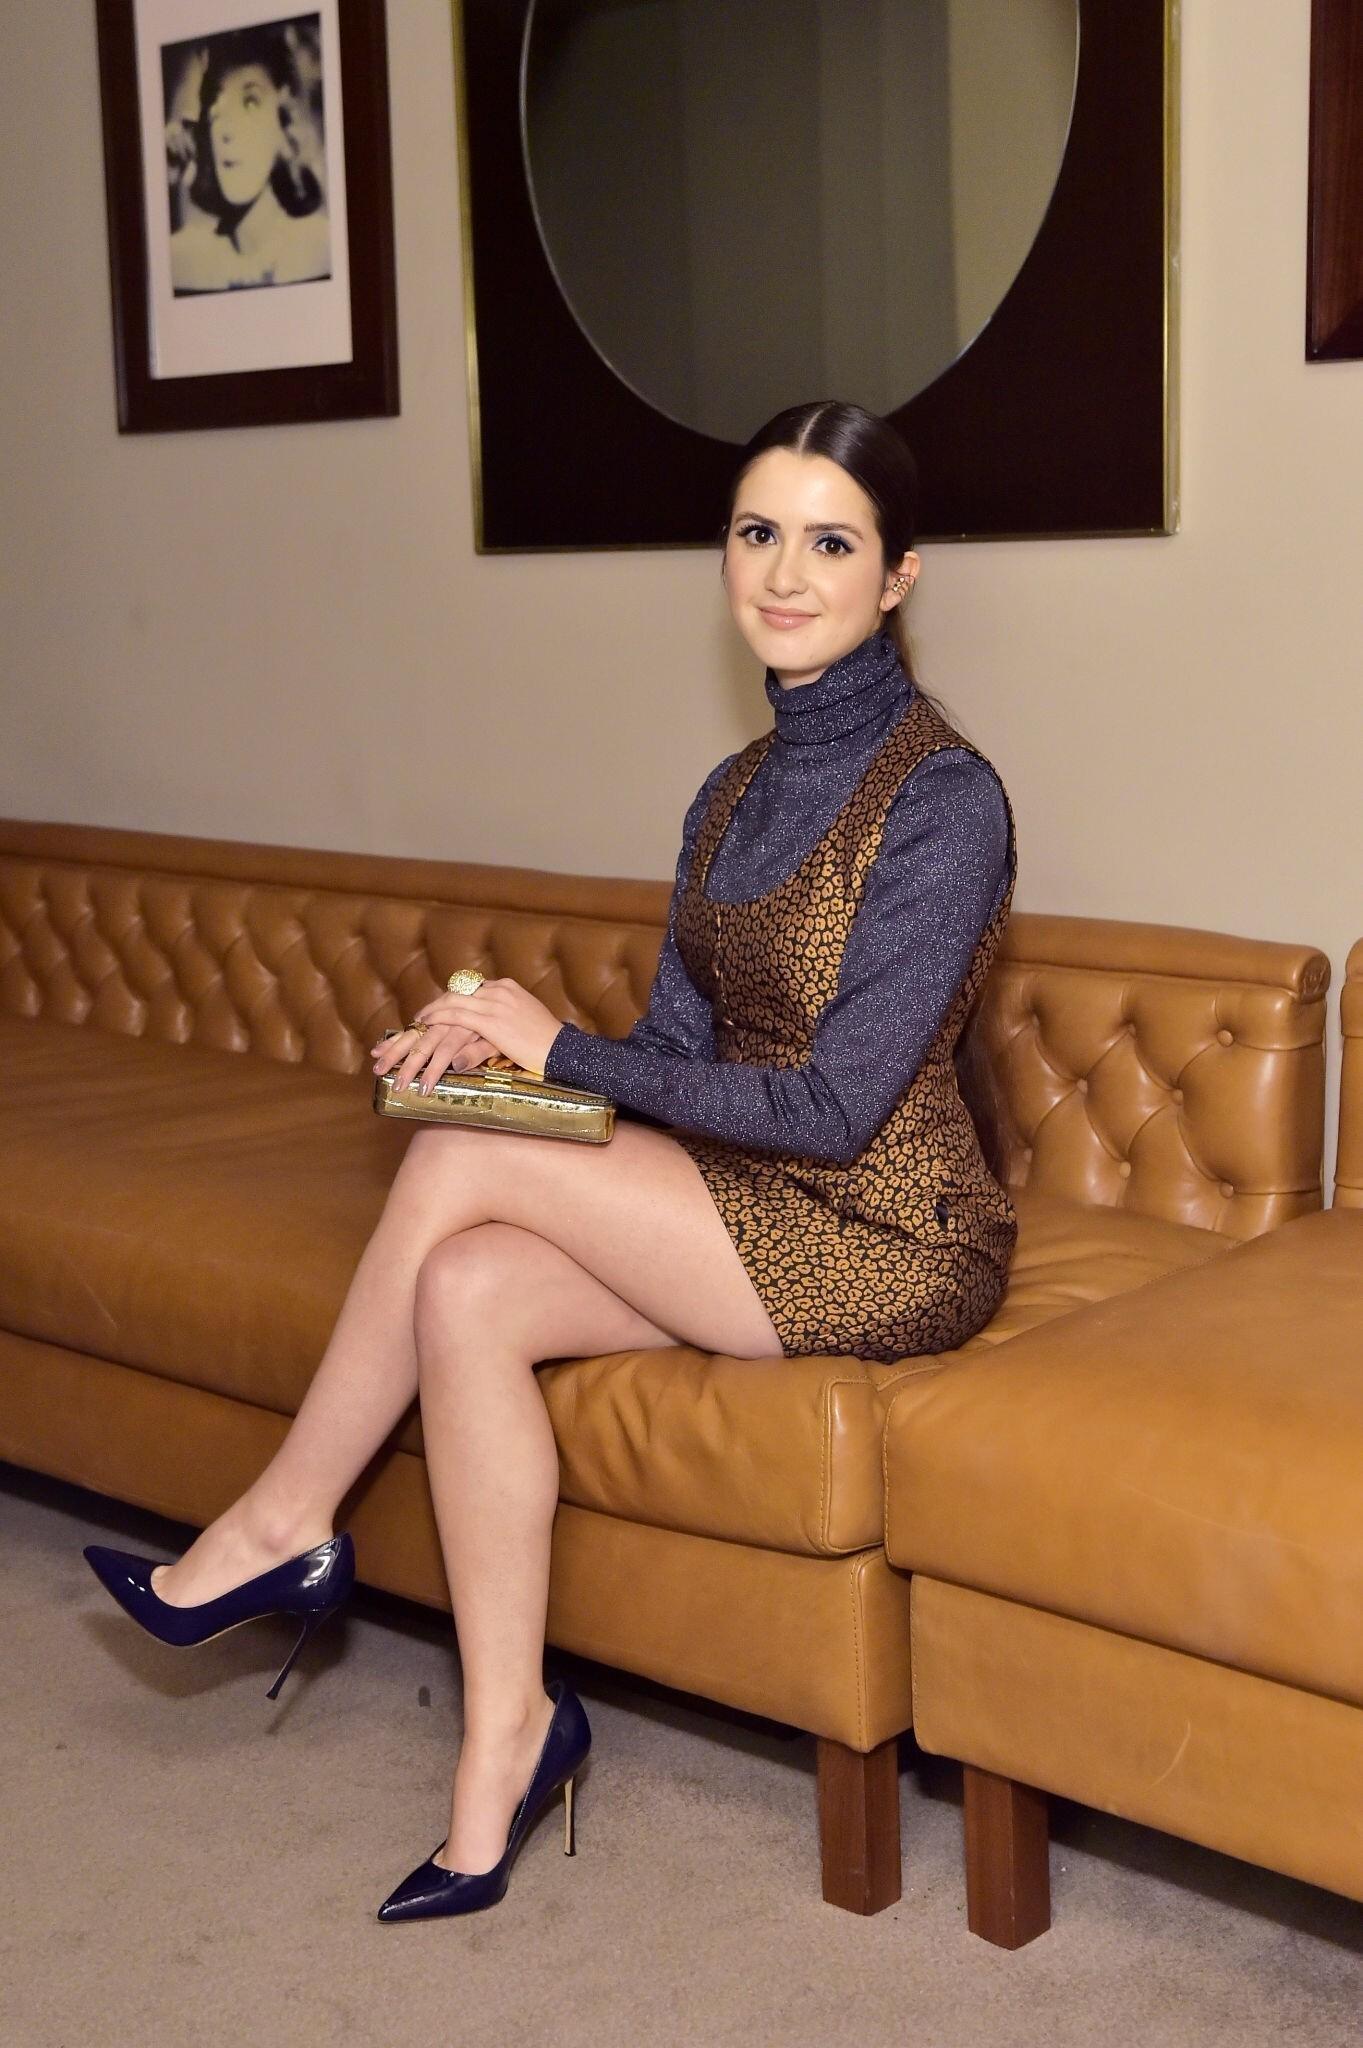 Laura Marano sexy legs pic